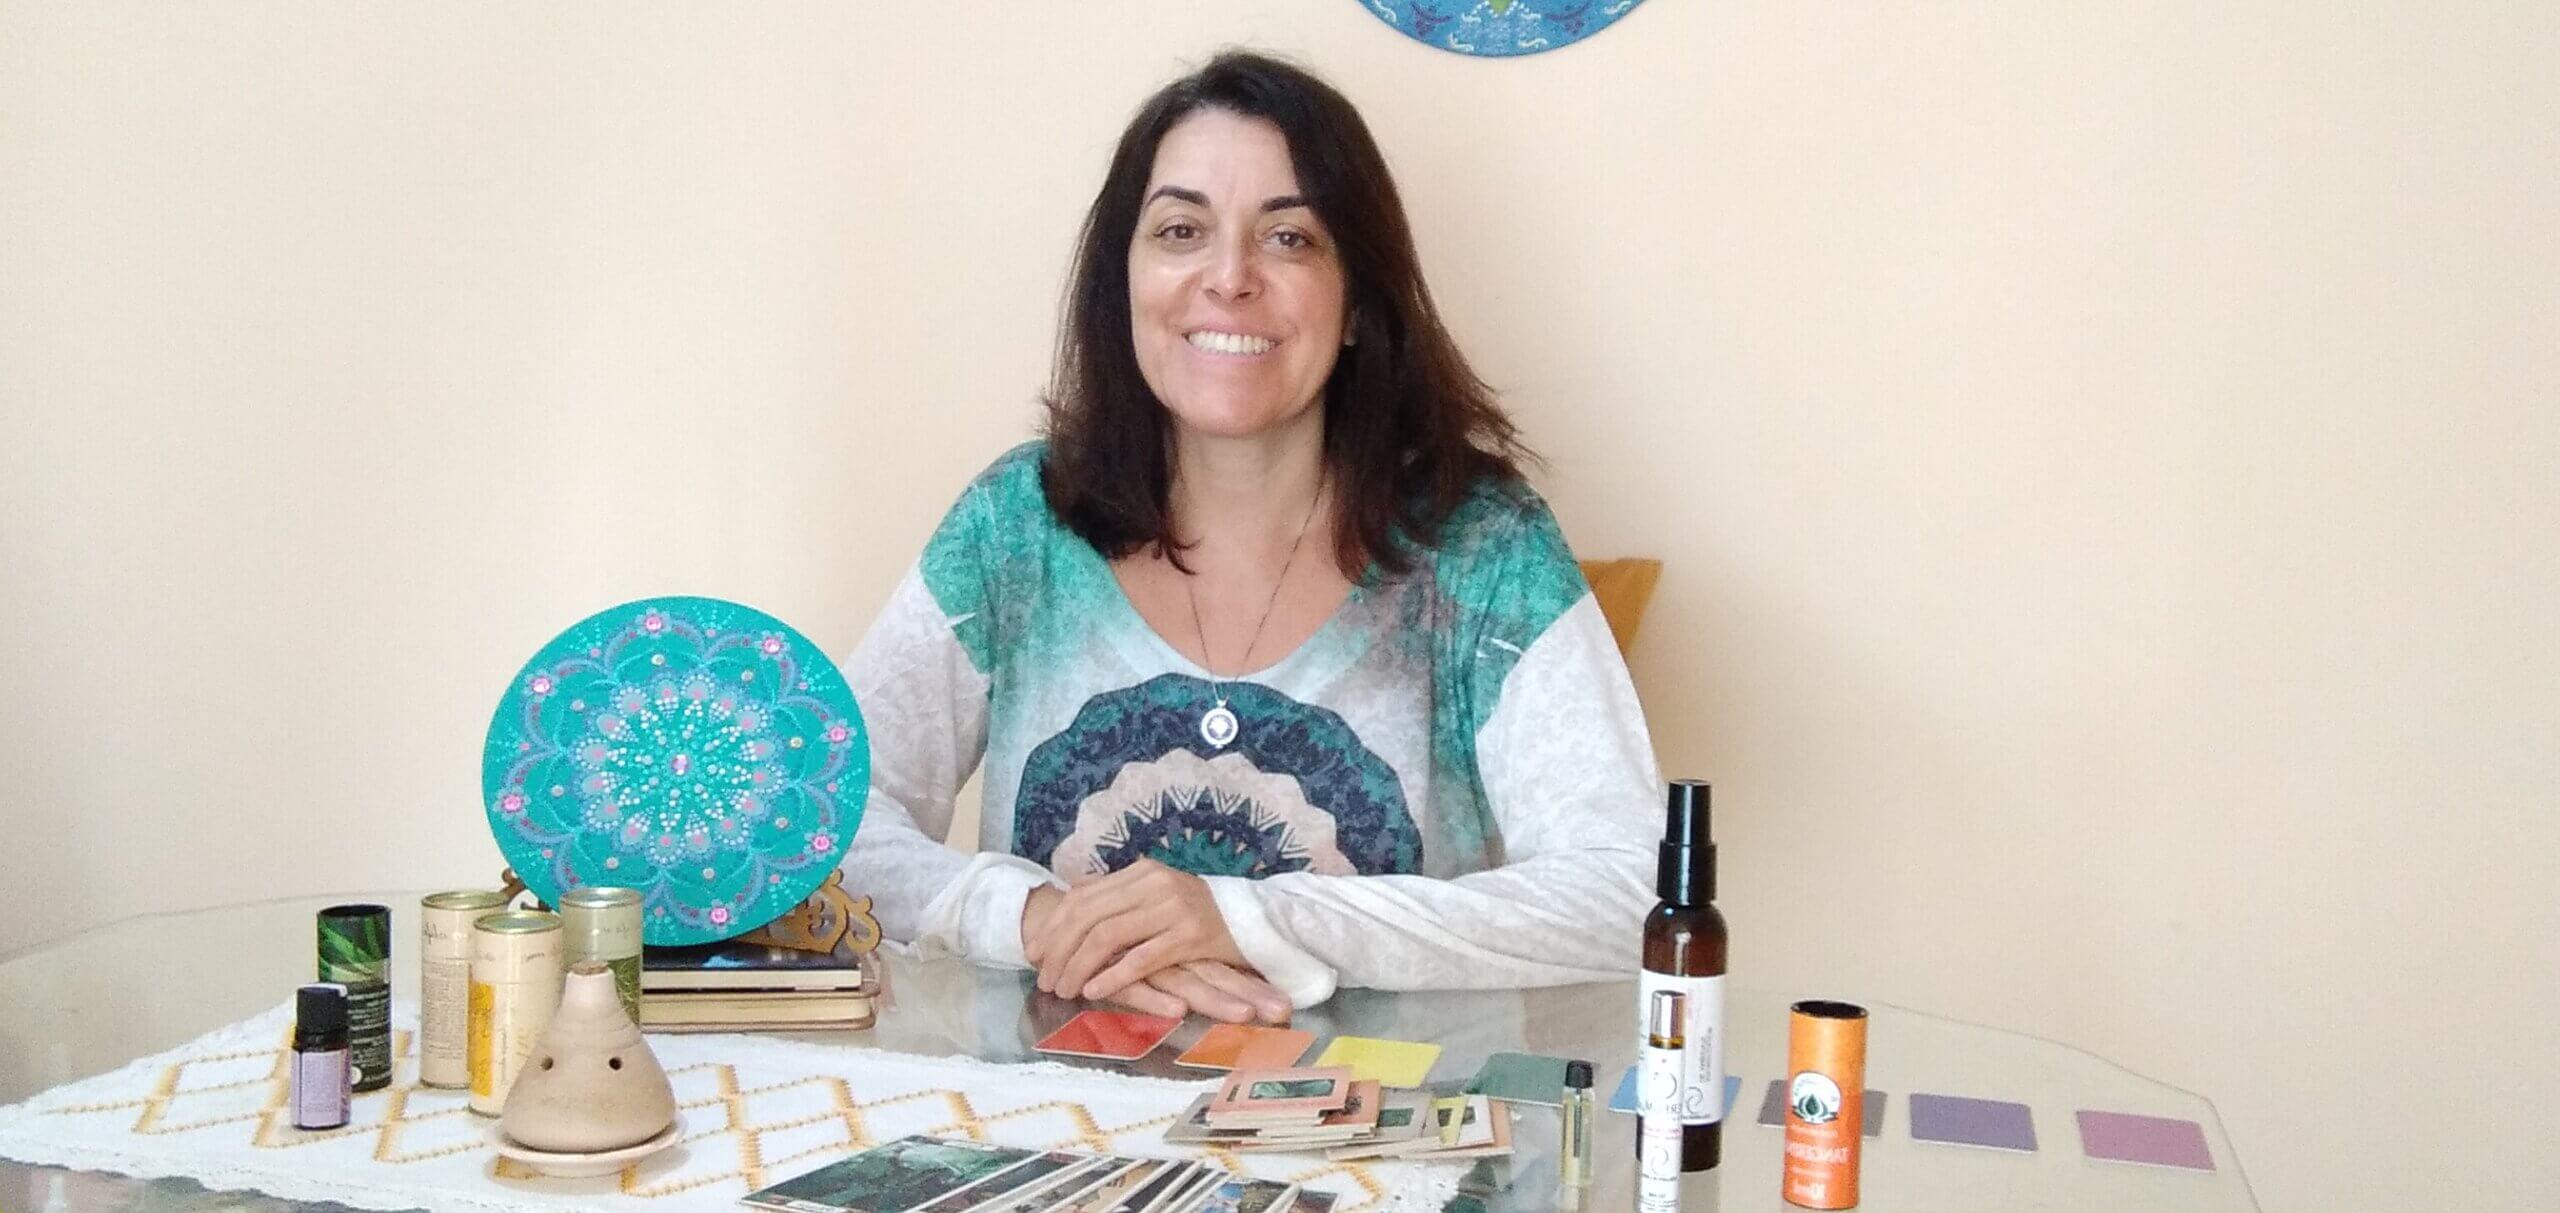 Jornada Inspira Aroma: autocuidado com Aromaterapia